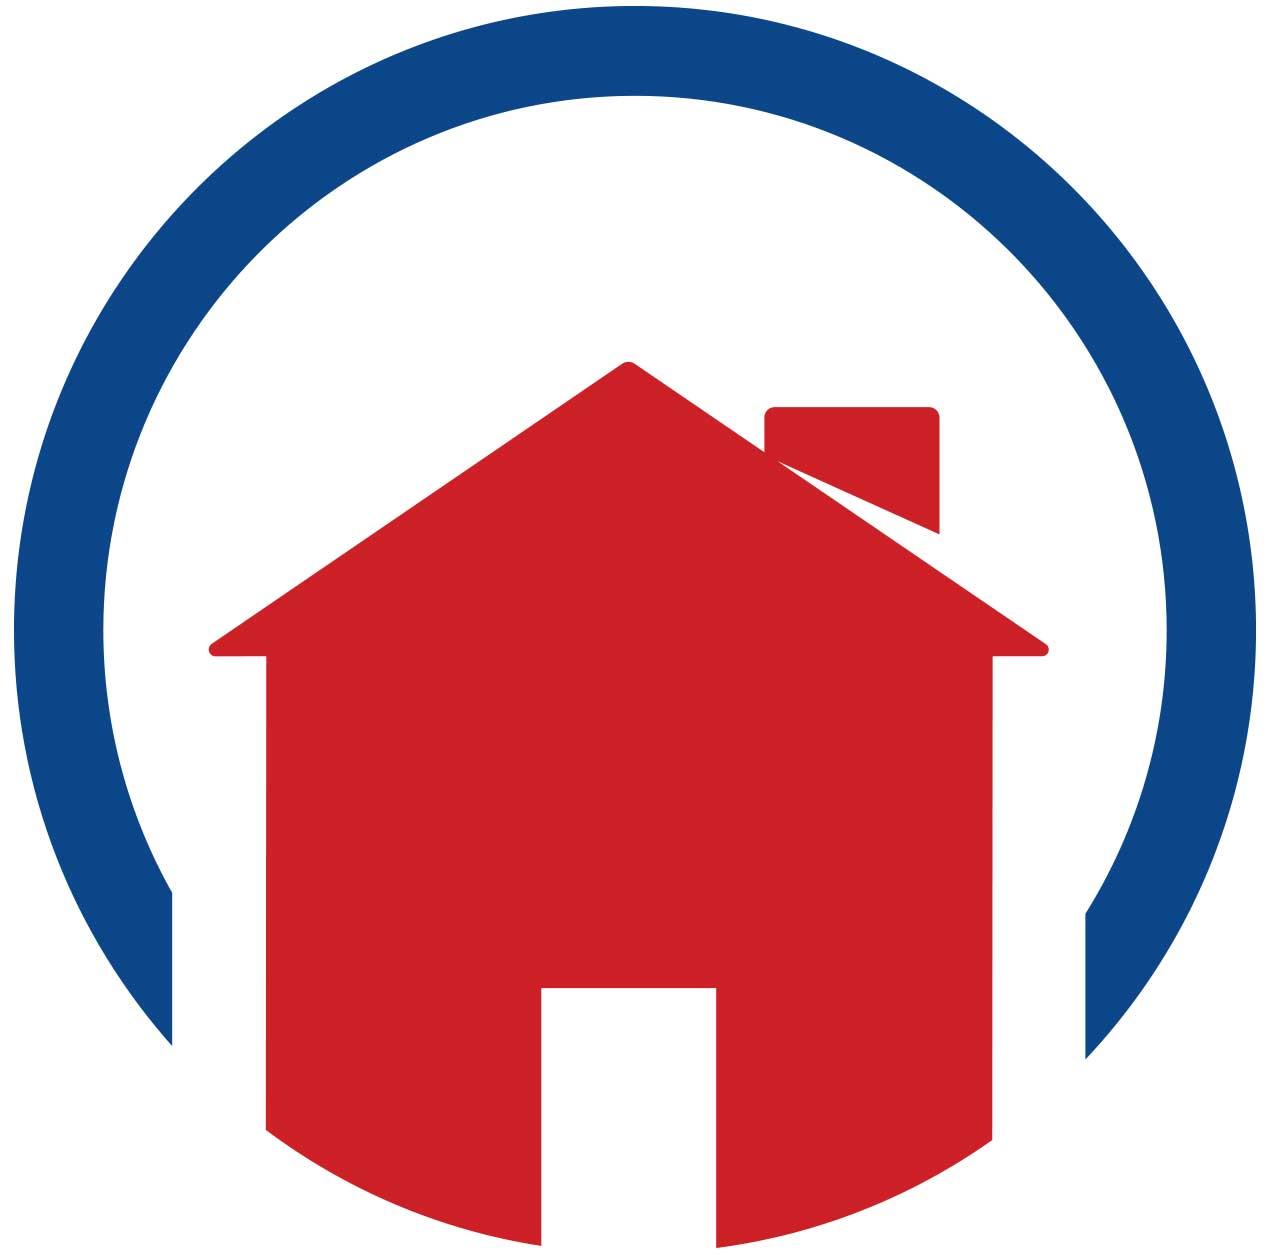 Home Repair Llc Exterior Renovation Storm Damage Restoration